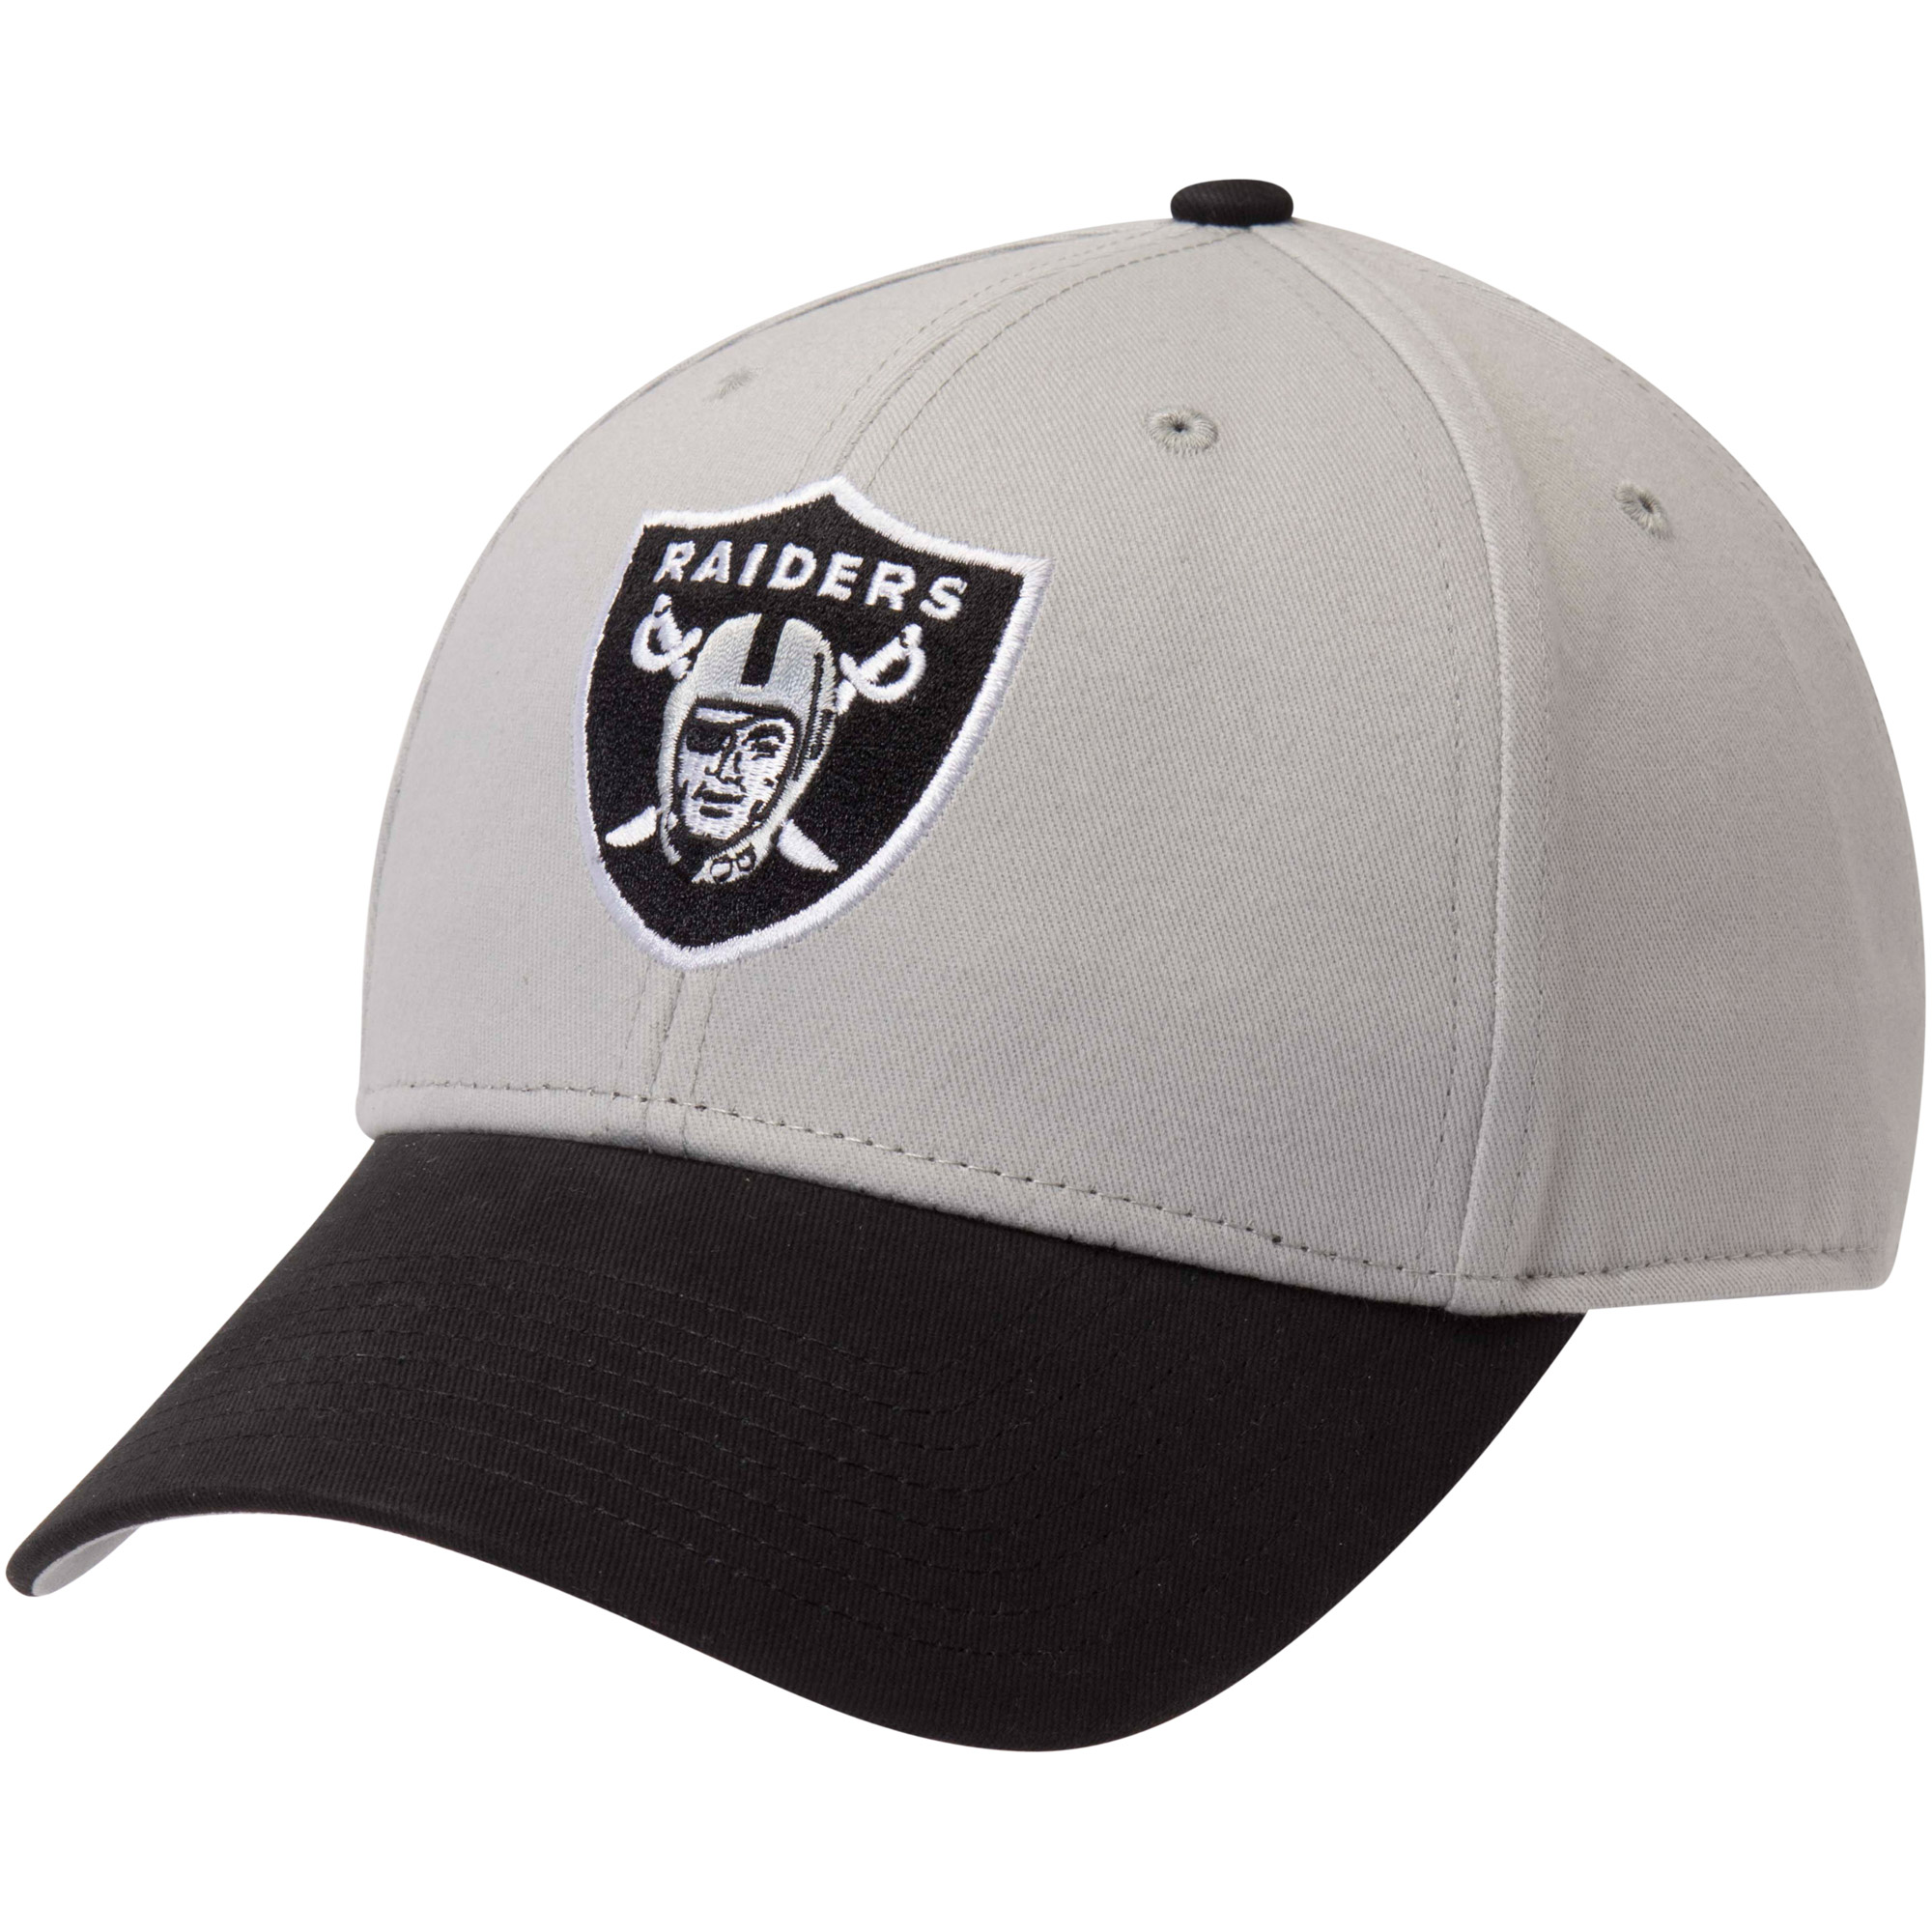 Men's Fan Favorite Gray/Black Oakland Raiders Two-Tone Adjustable Hat - OSFA